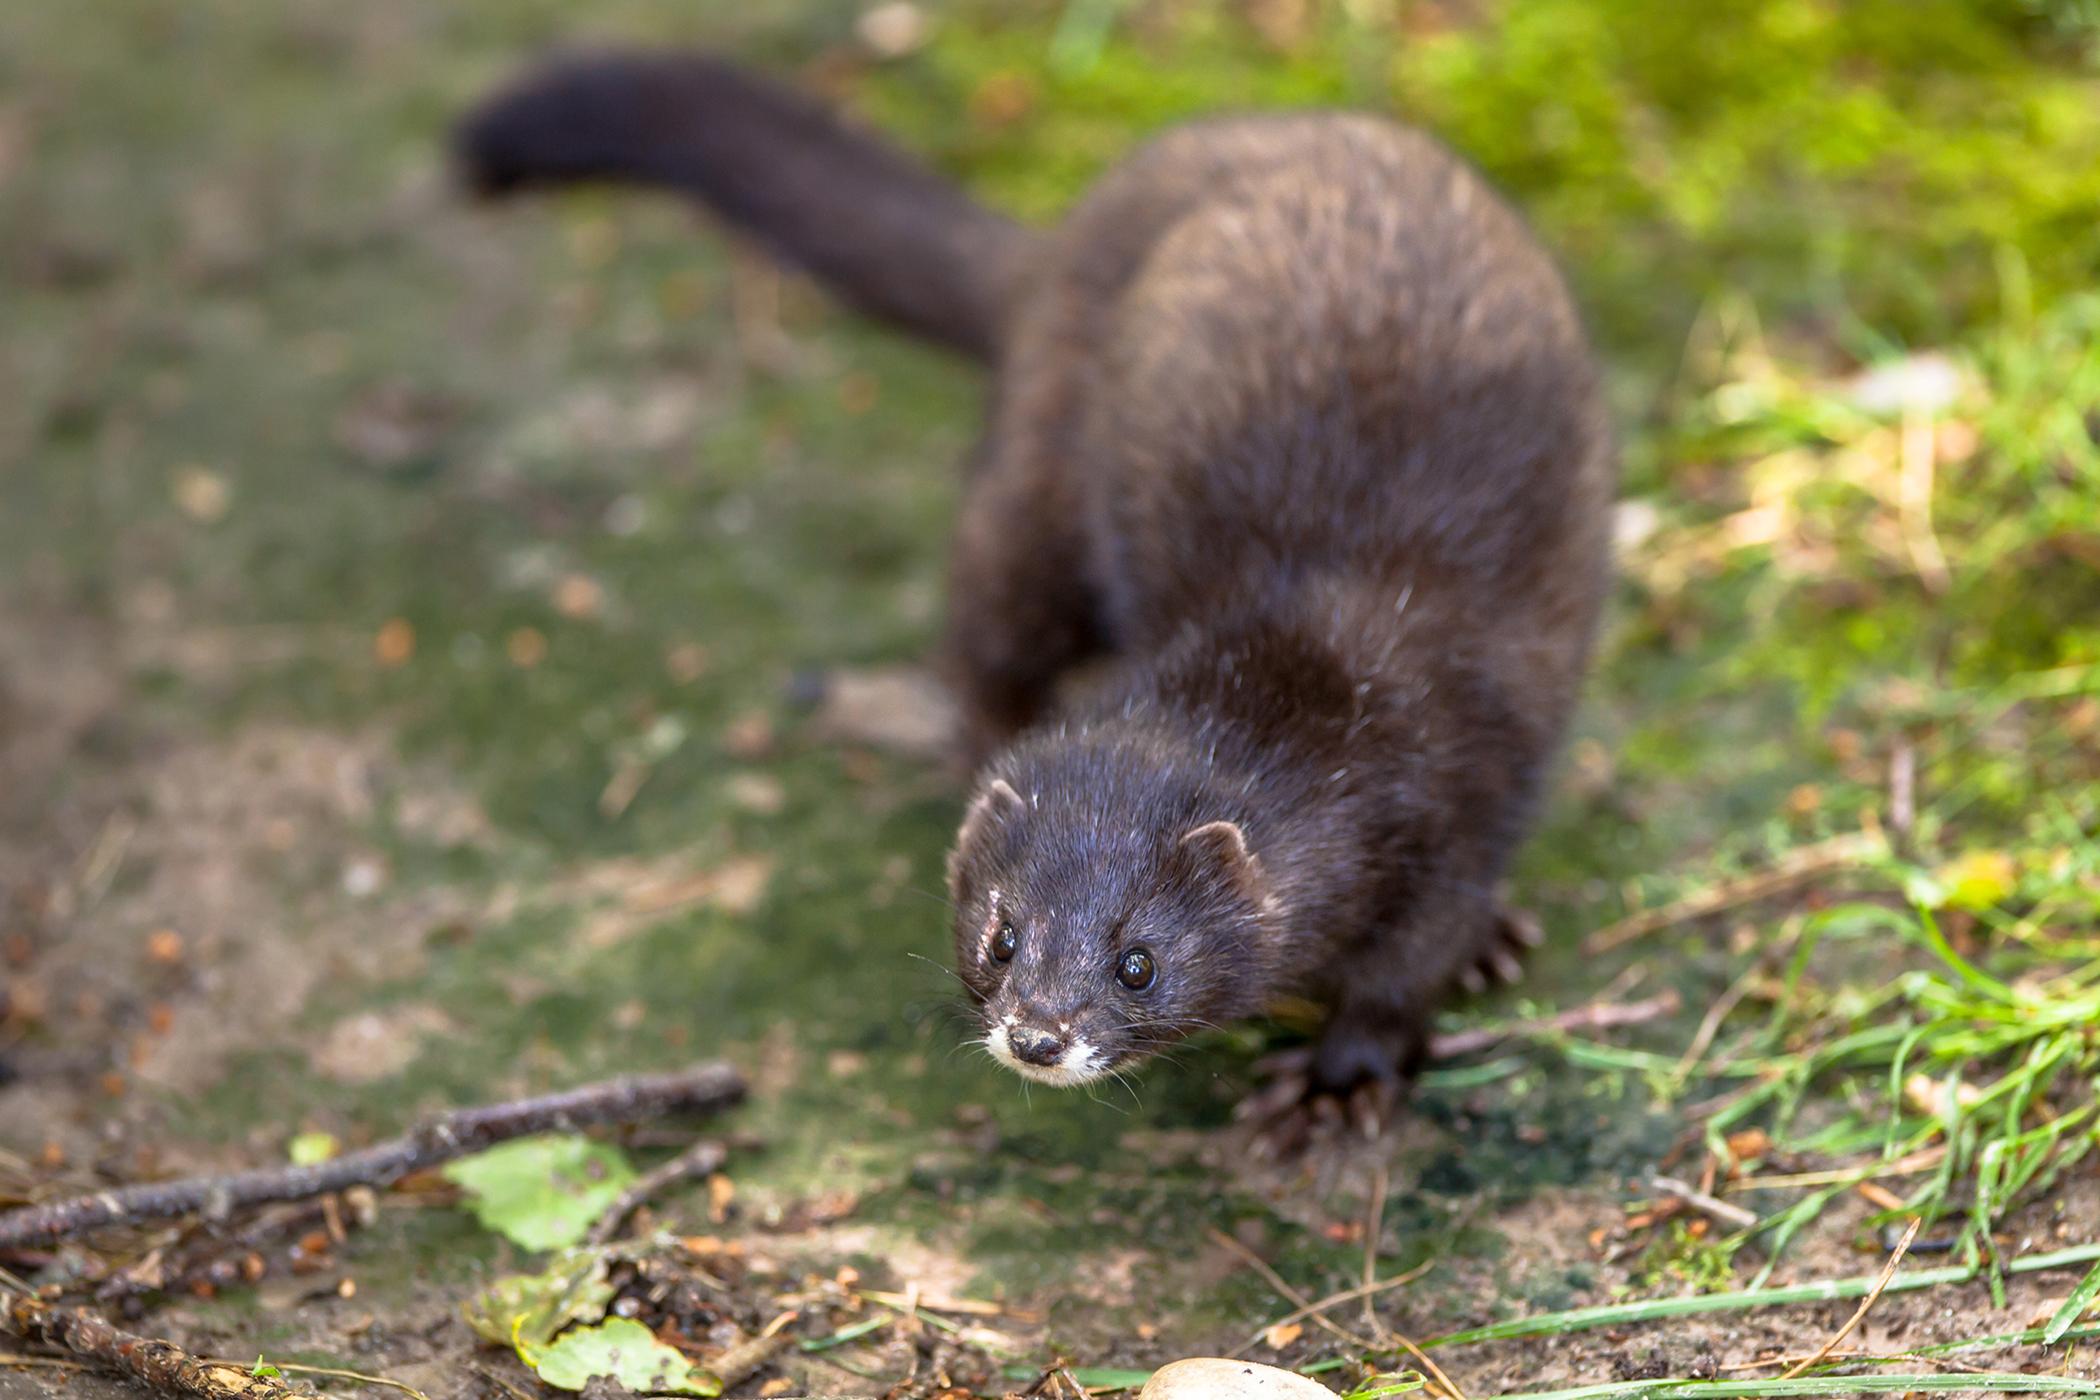 Black Tarry Feces in Ferrets